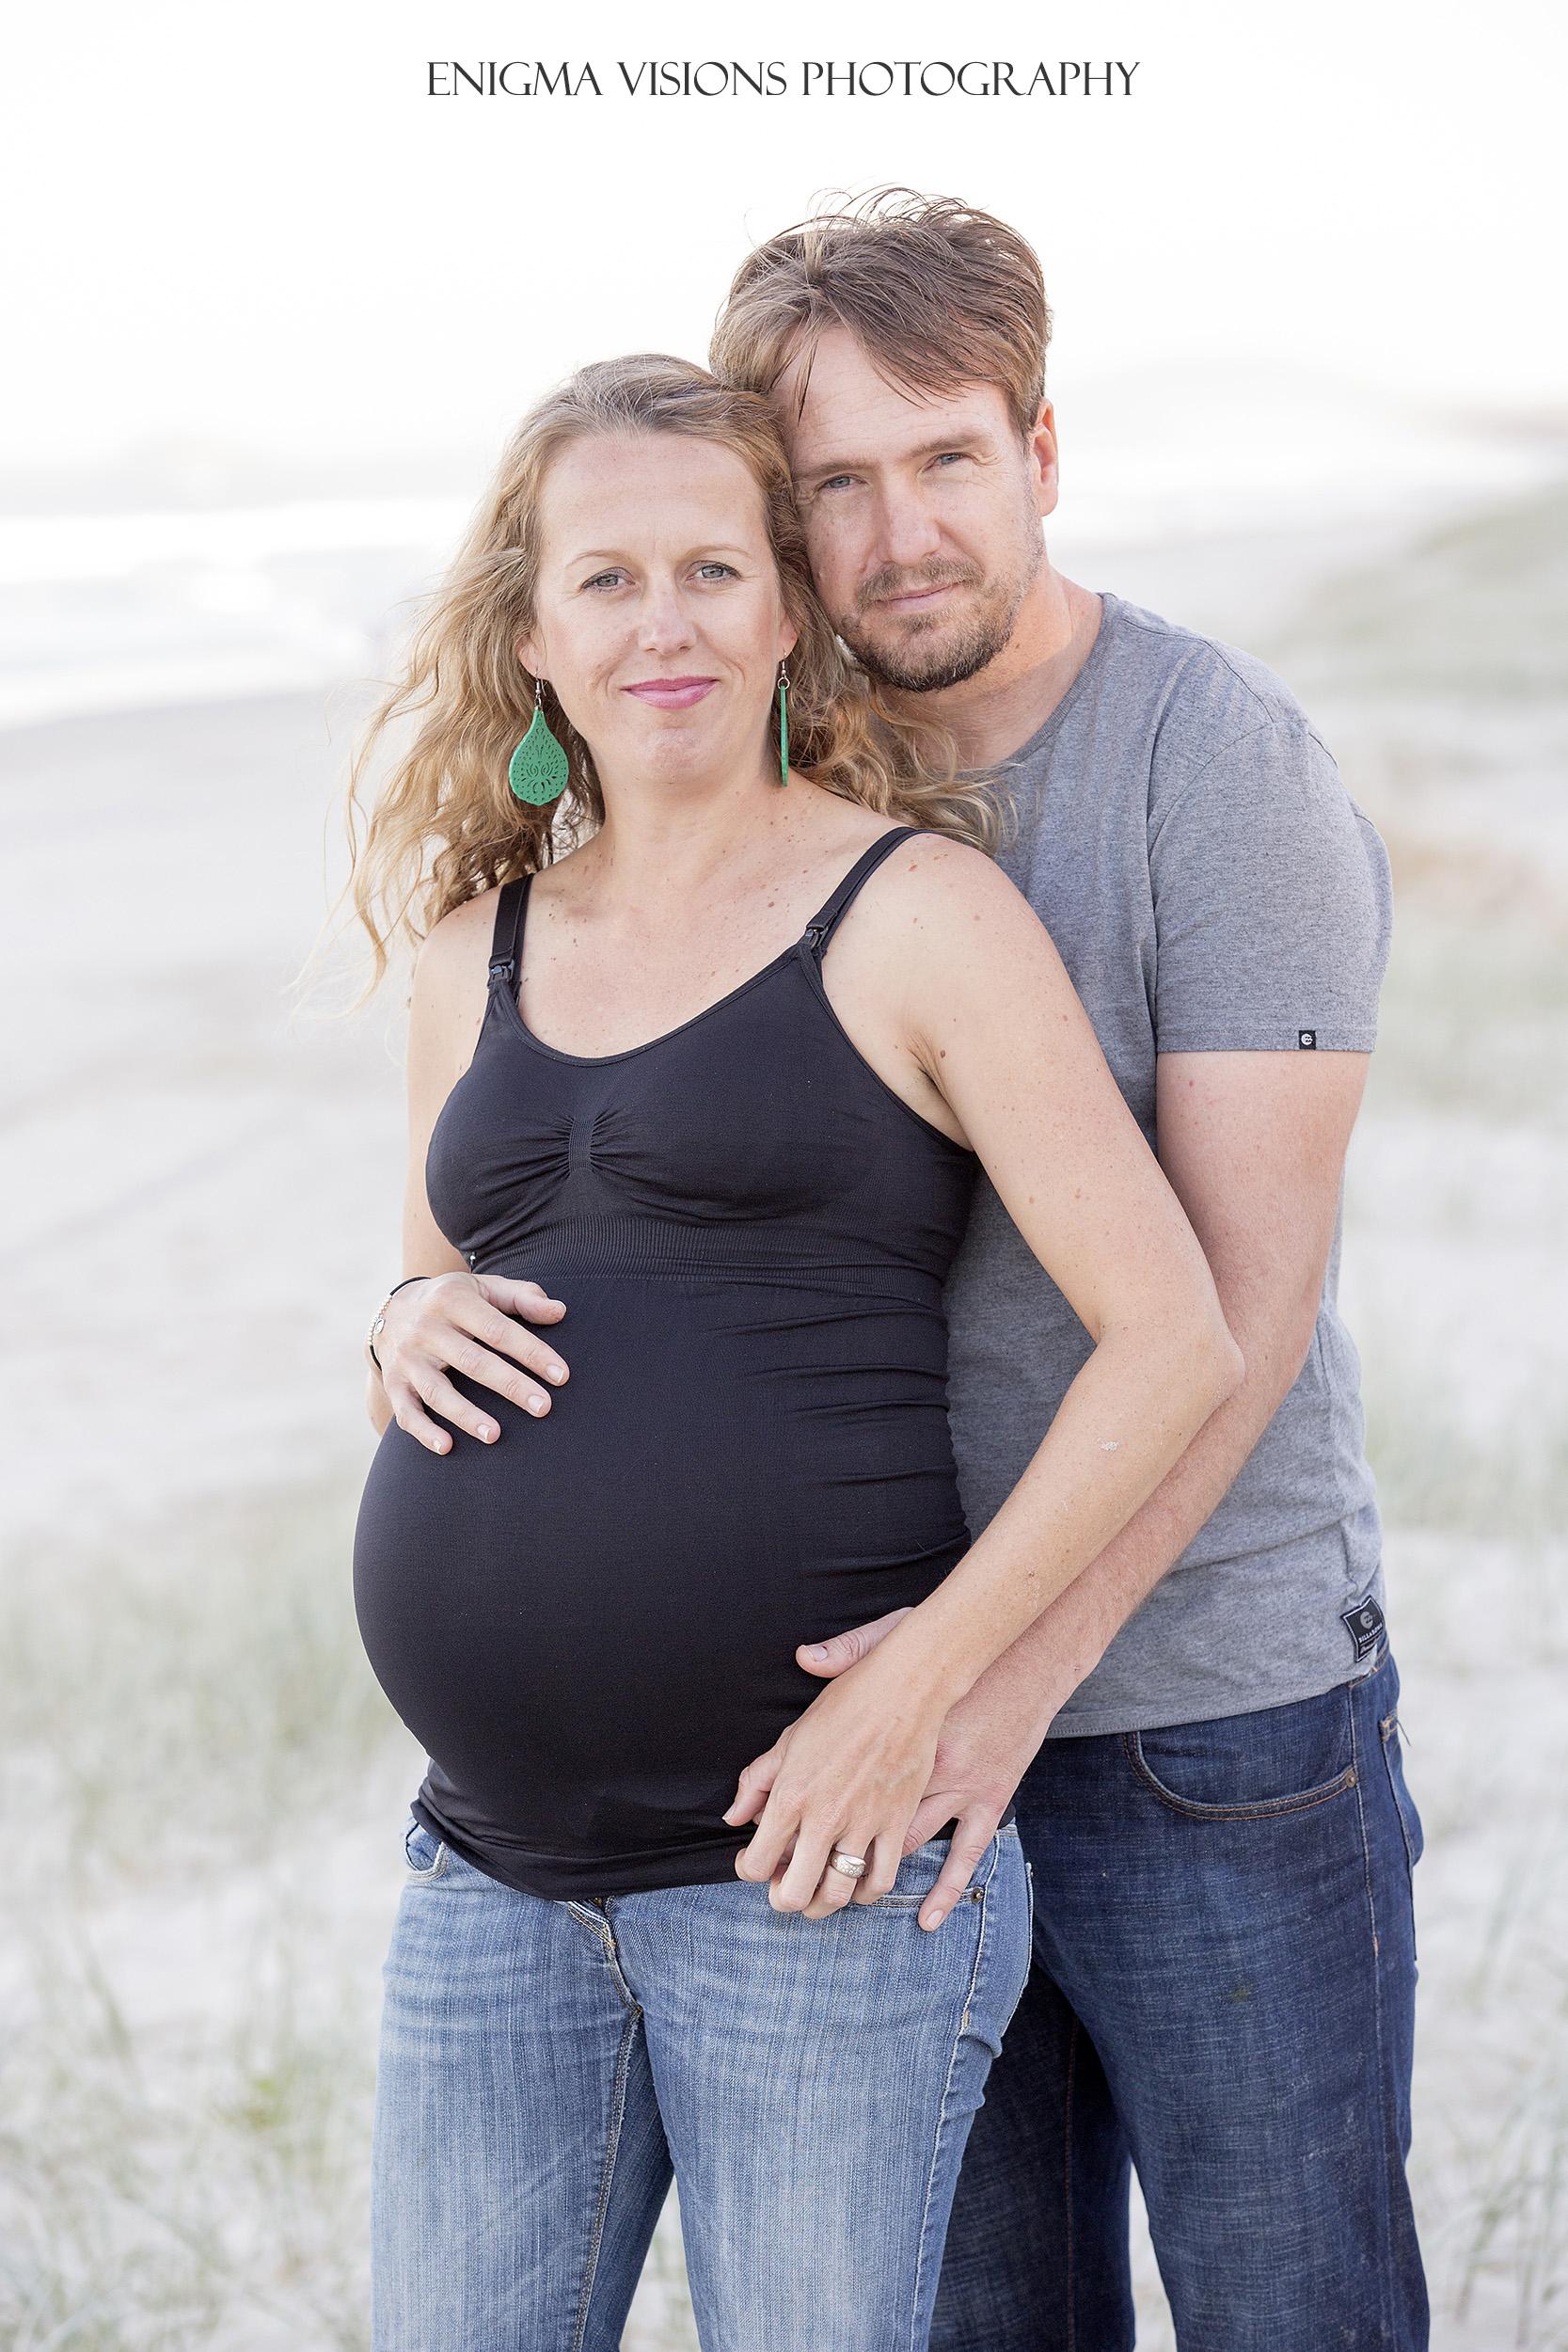 enigma_visions_photography_maternity_melandandrew_kingscliff (25).jpg